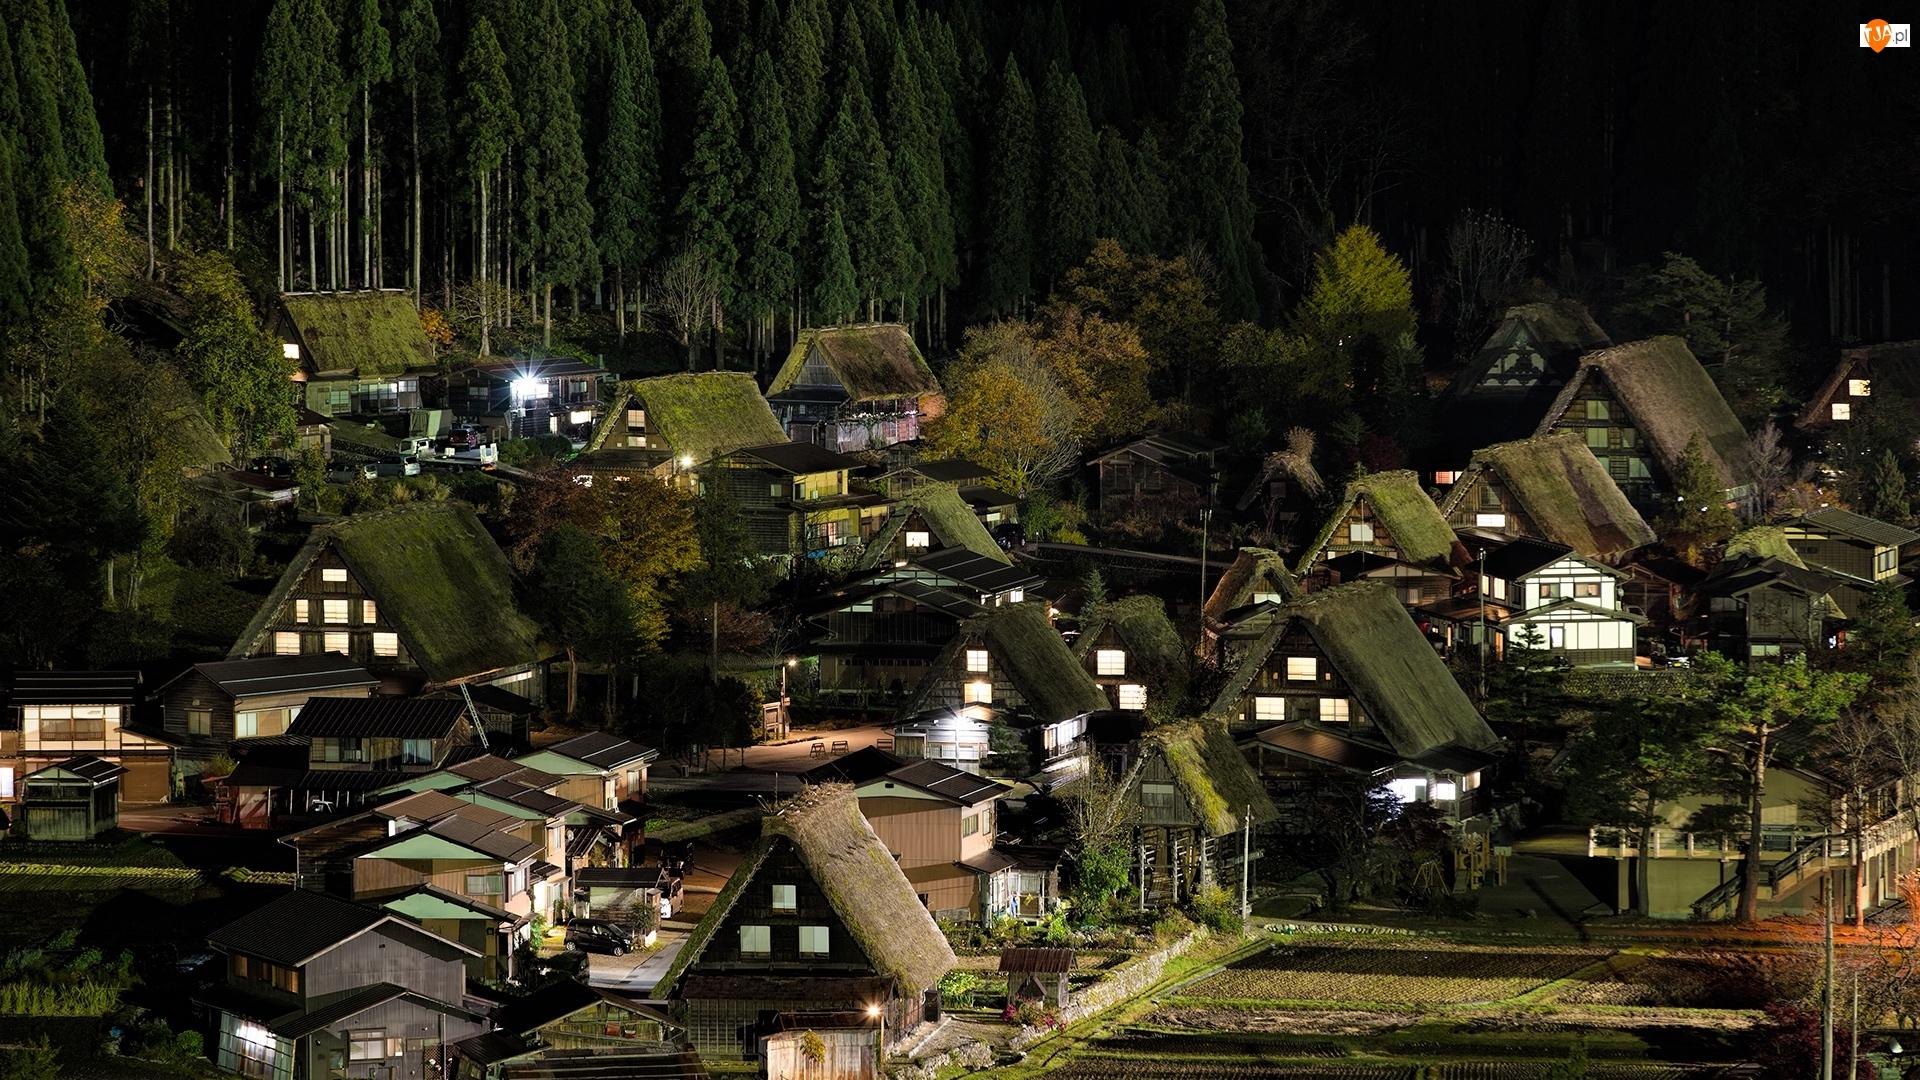 Prefektura Gifu, Wioska Shirakawa, Noc, Las, Japonia, Domy